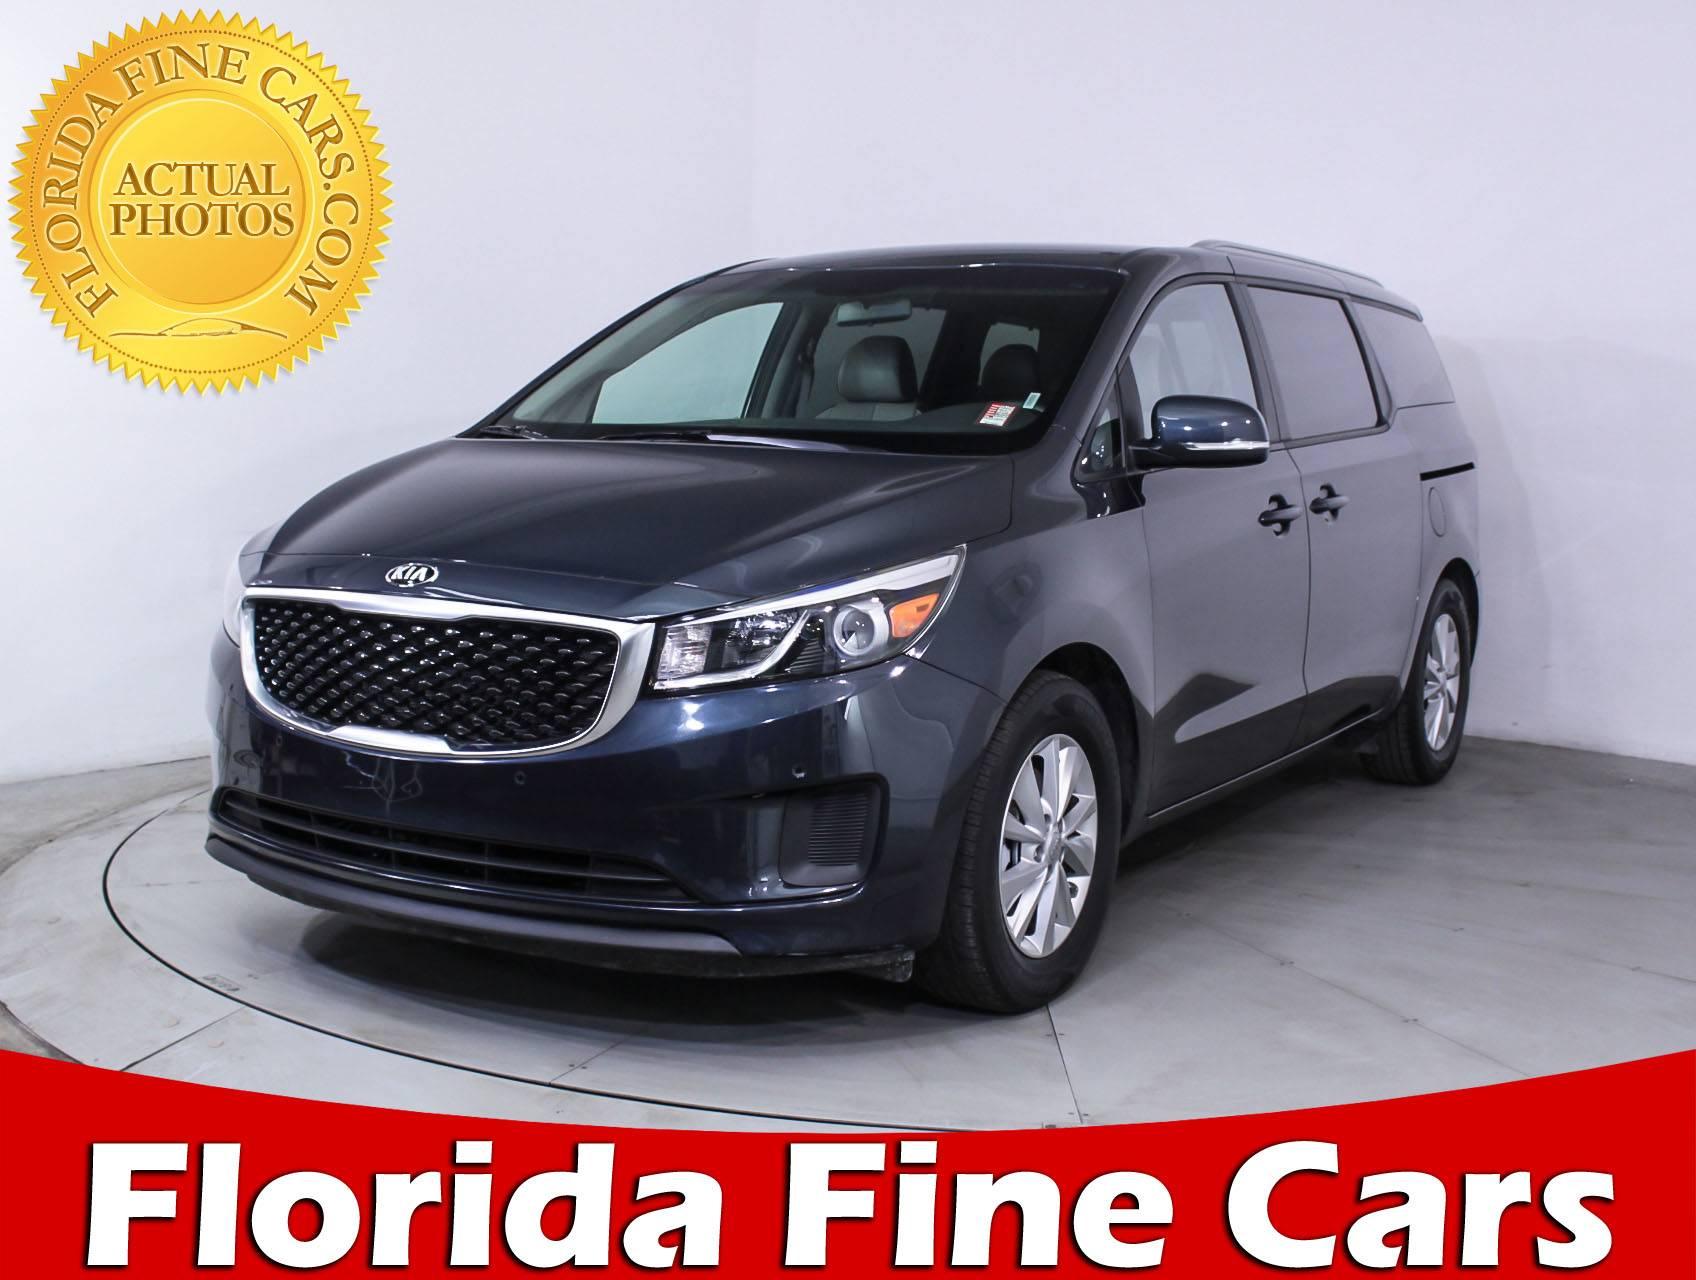 Used 2017 KIA SEDONA Lx Minivan for sale in MIAMI FL